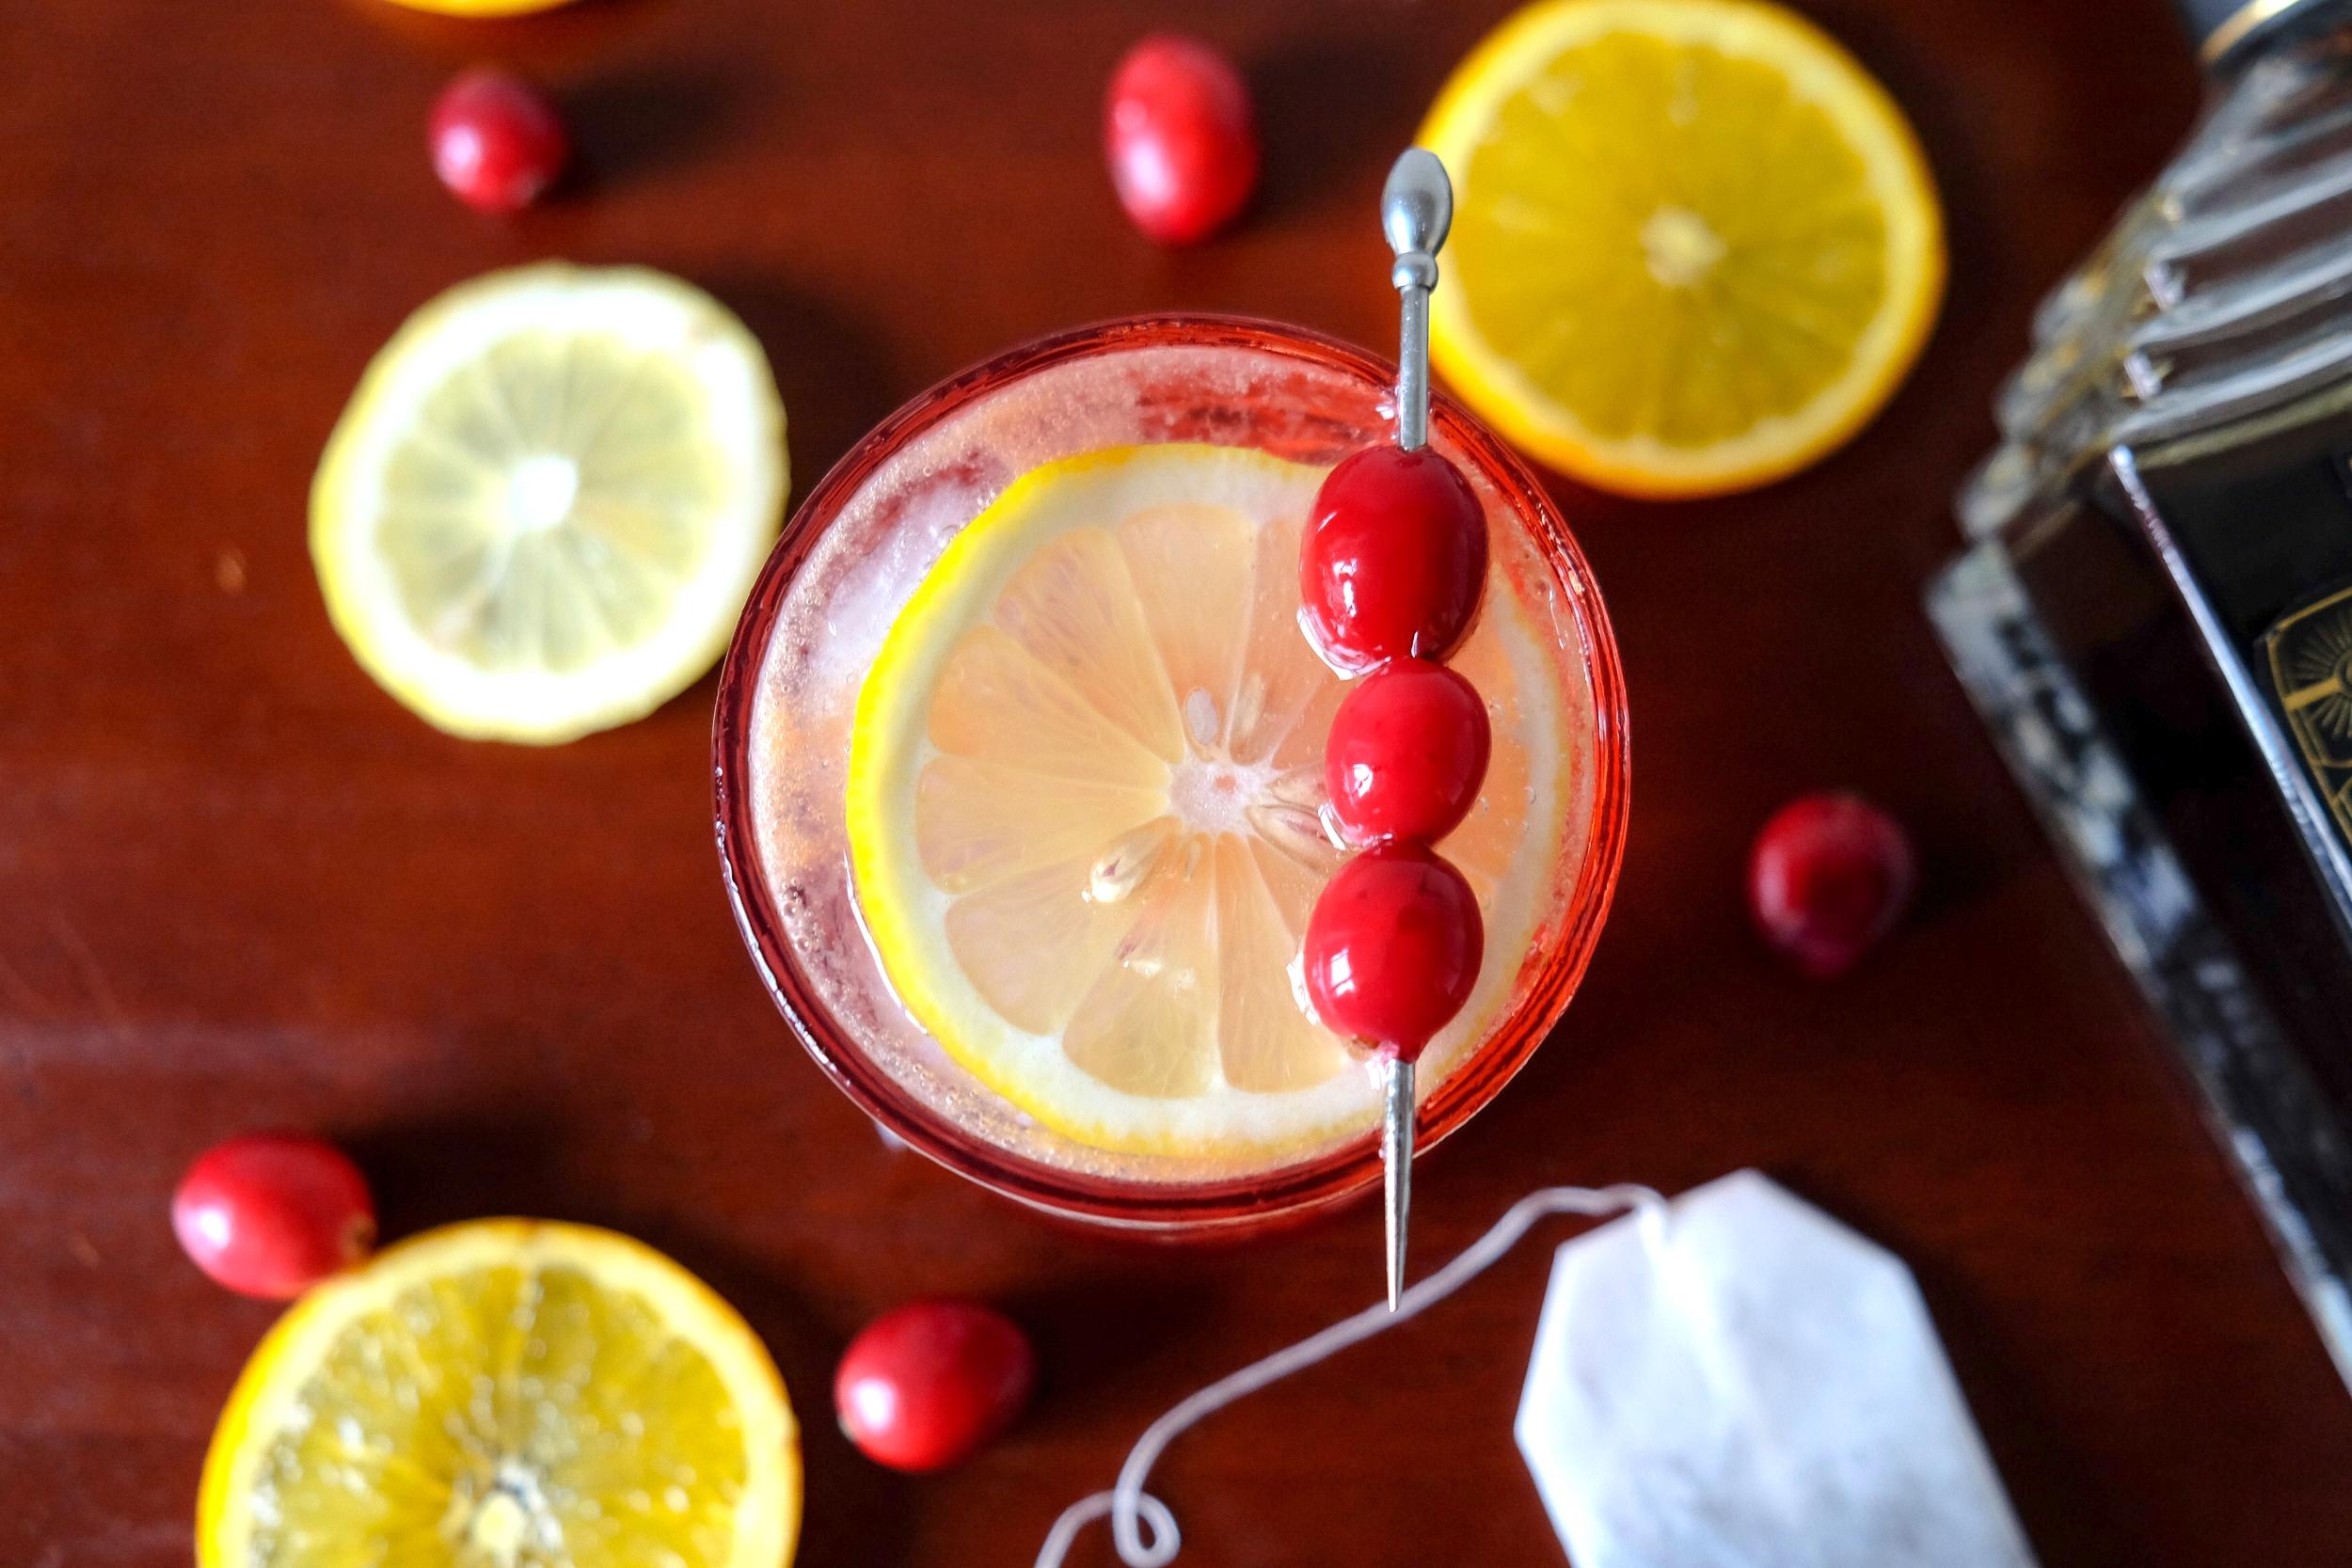 Manhattan Moonshine - Black Tea Punch by Nikki Davidson